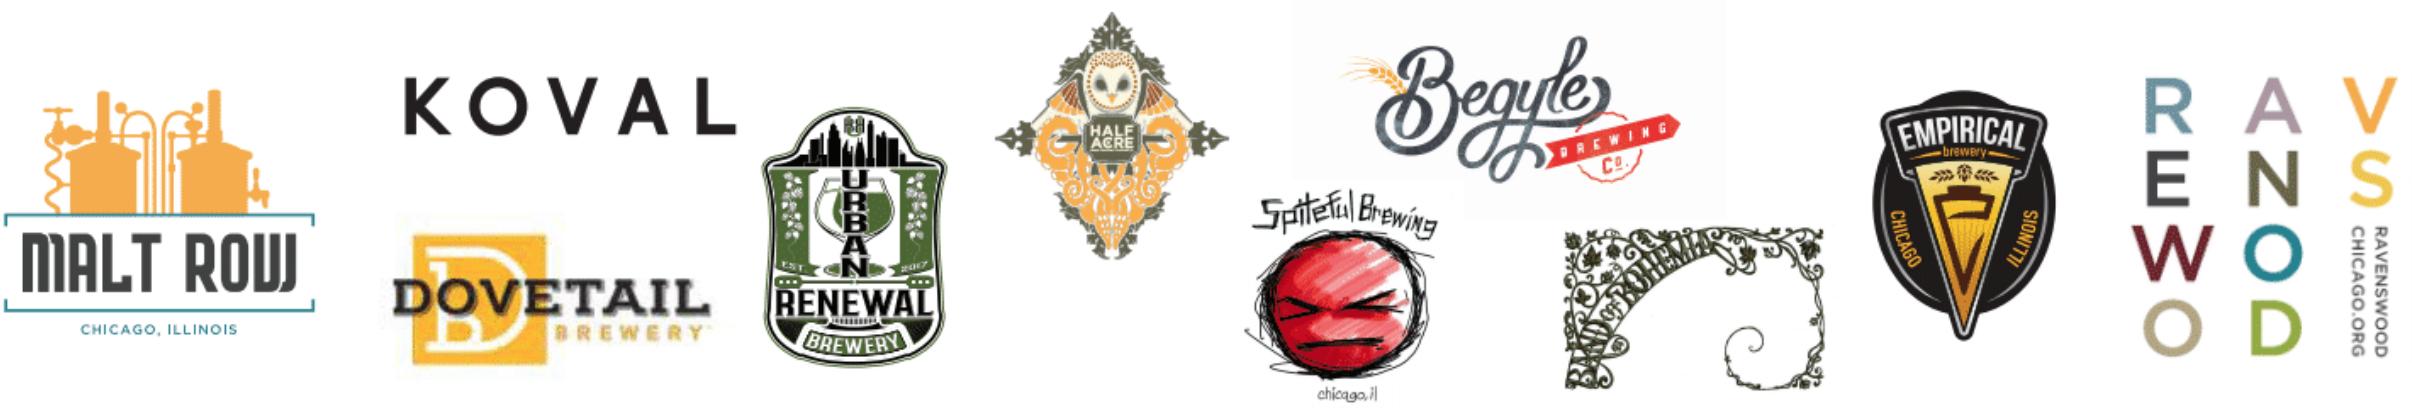 Malt Row Brewery Logos